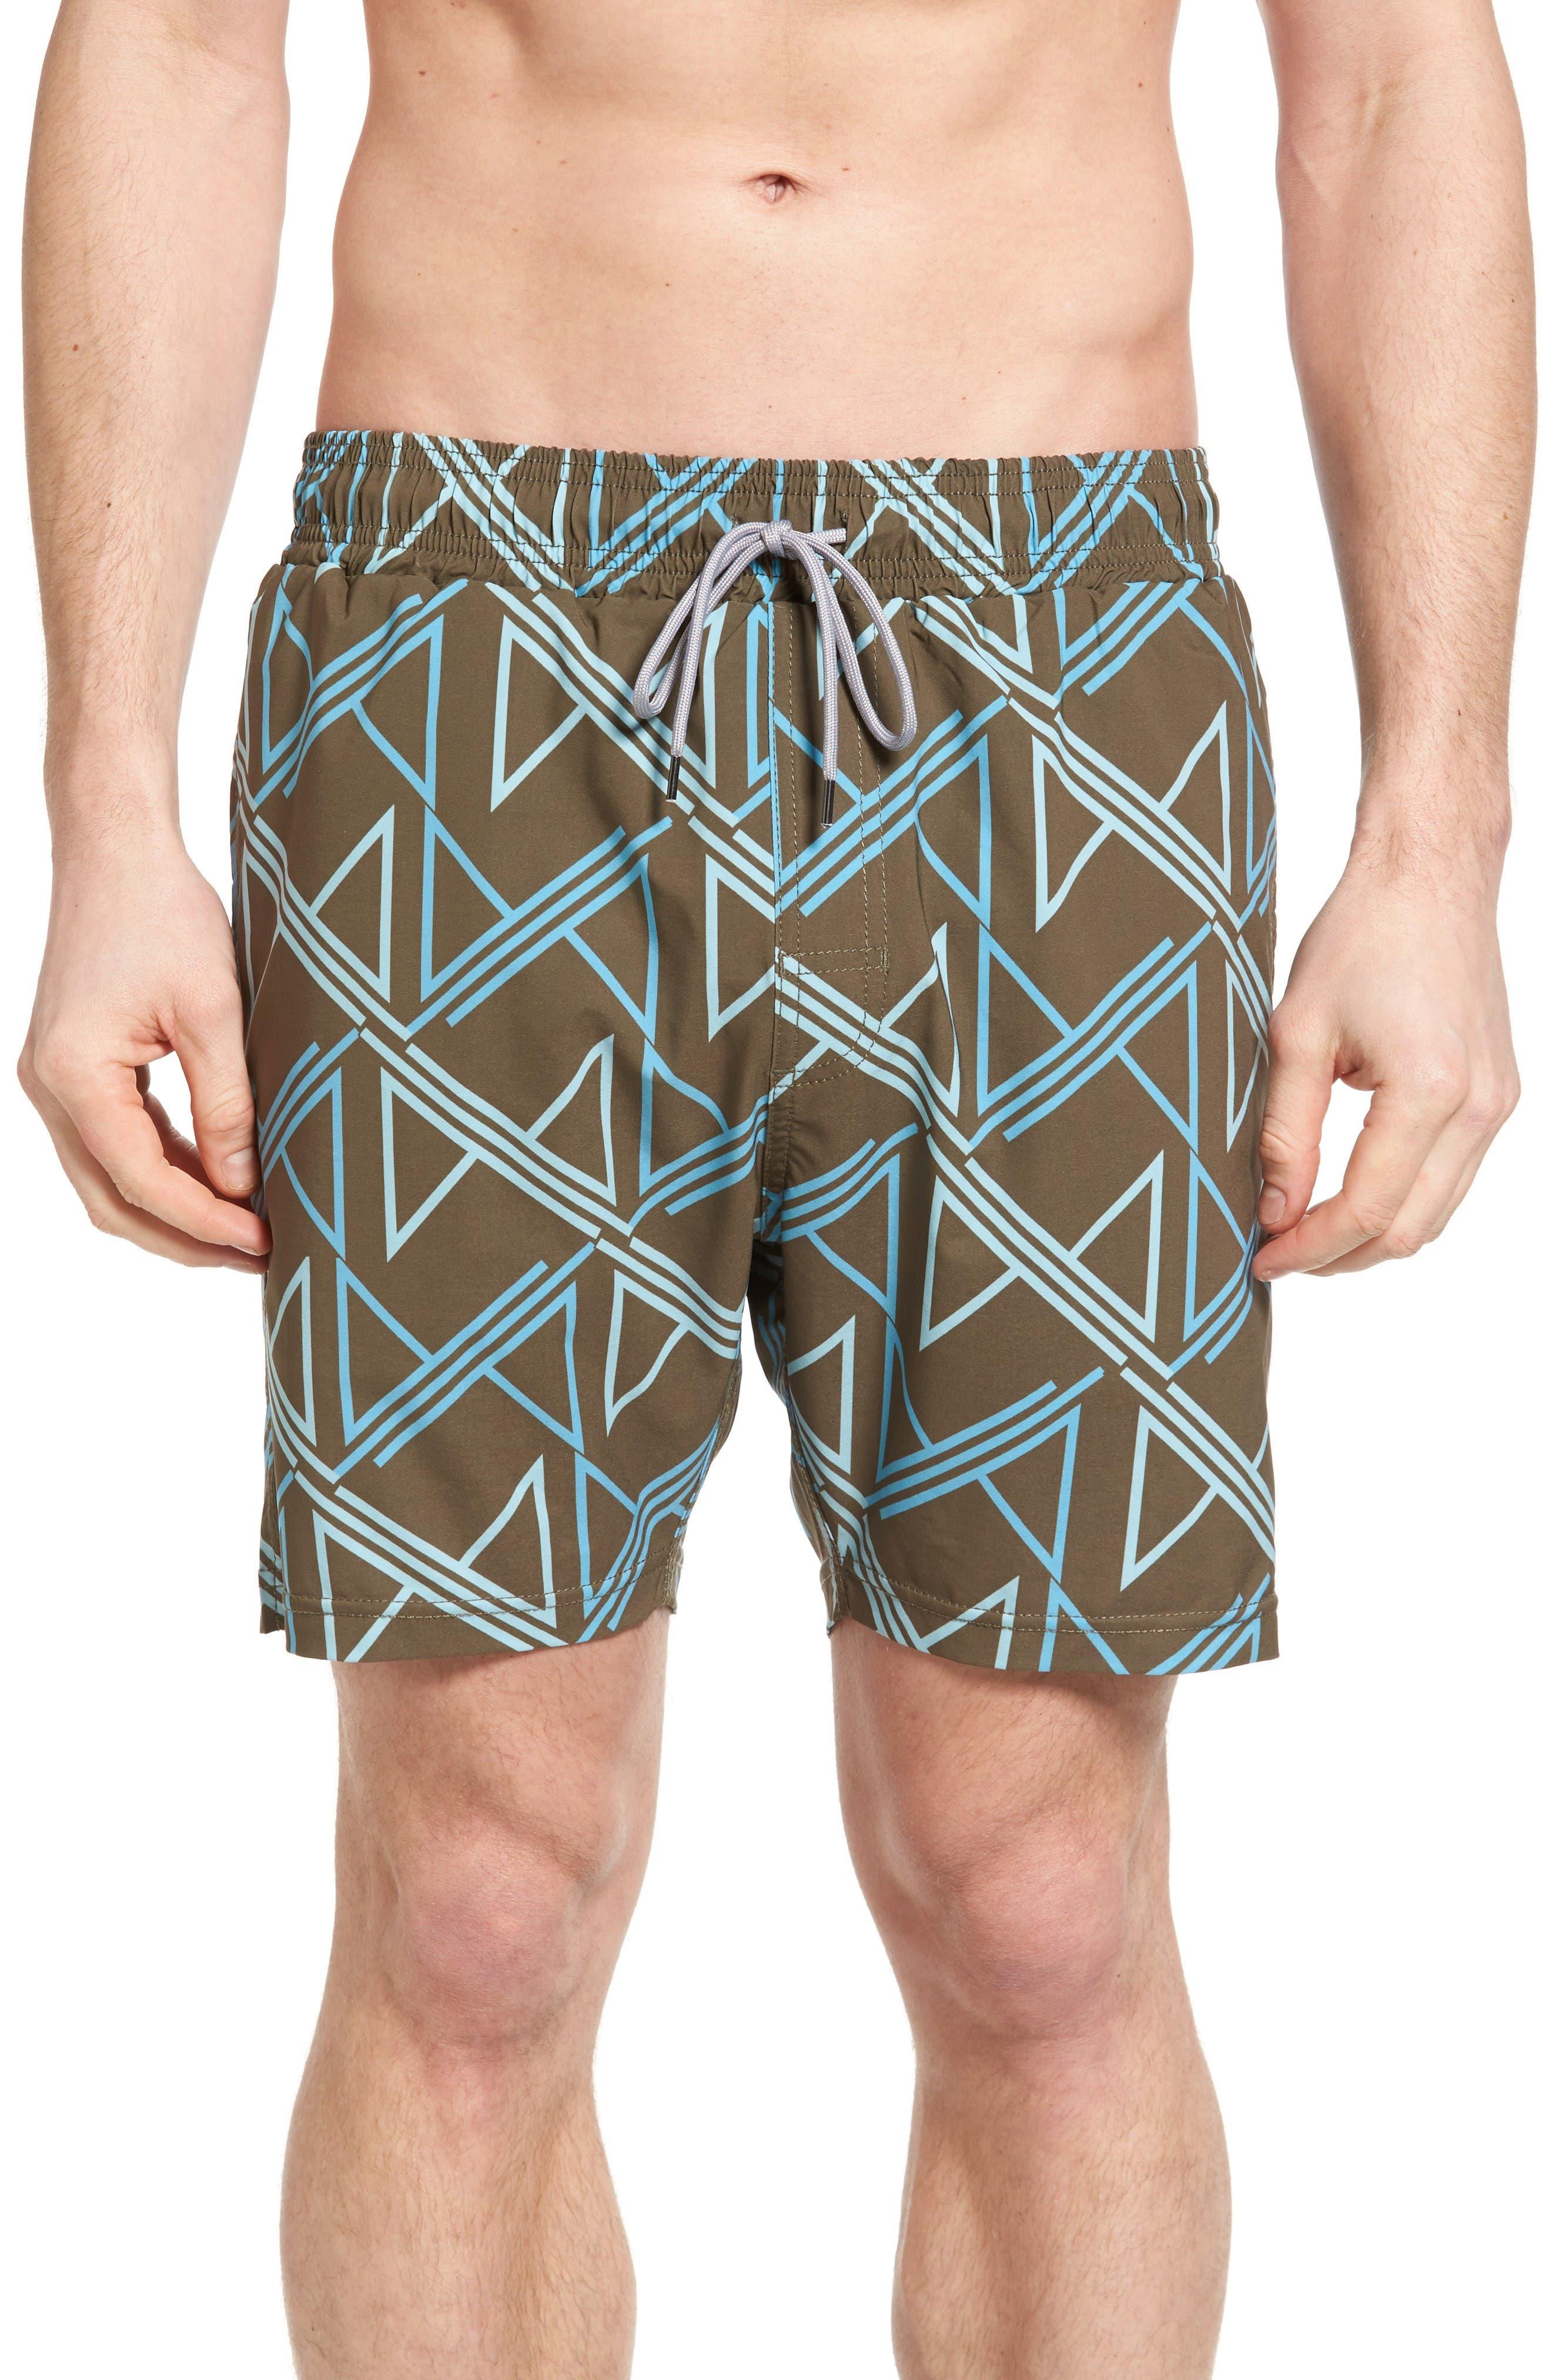 Lanai Collection Elastic Waist Swim Shorts